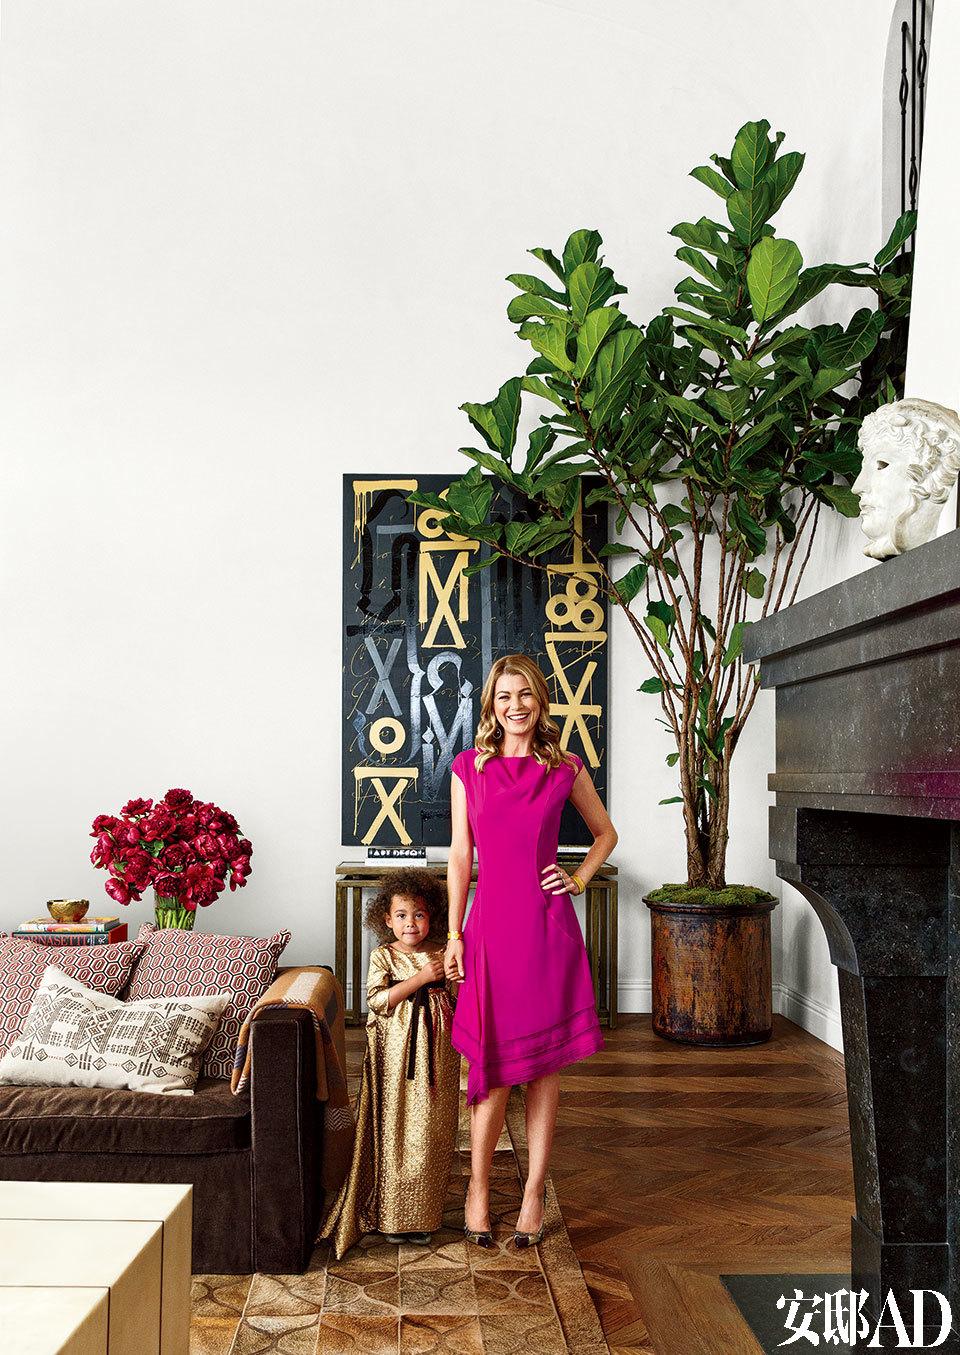 Ellen Pompeo带着她的大女儿Stella Luna站在客厅中。Pompeo身穿的连衣裙来自Nina Ricci,高跟鞋来自 Christian Louboutin。